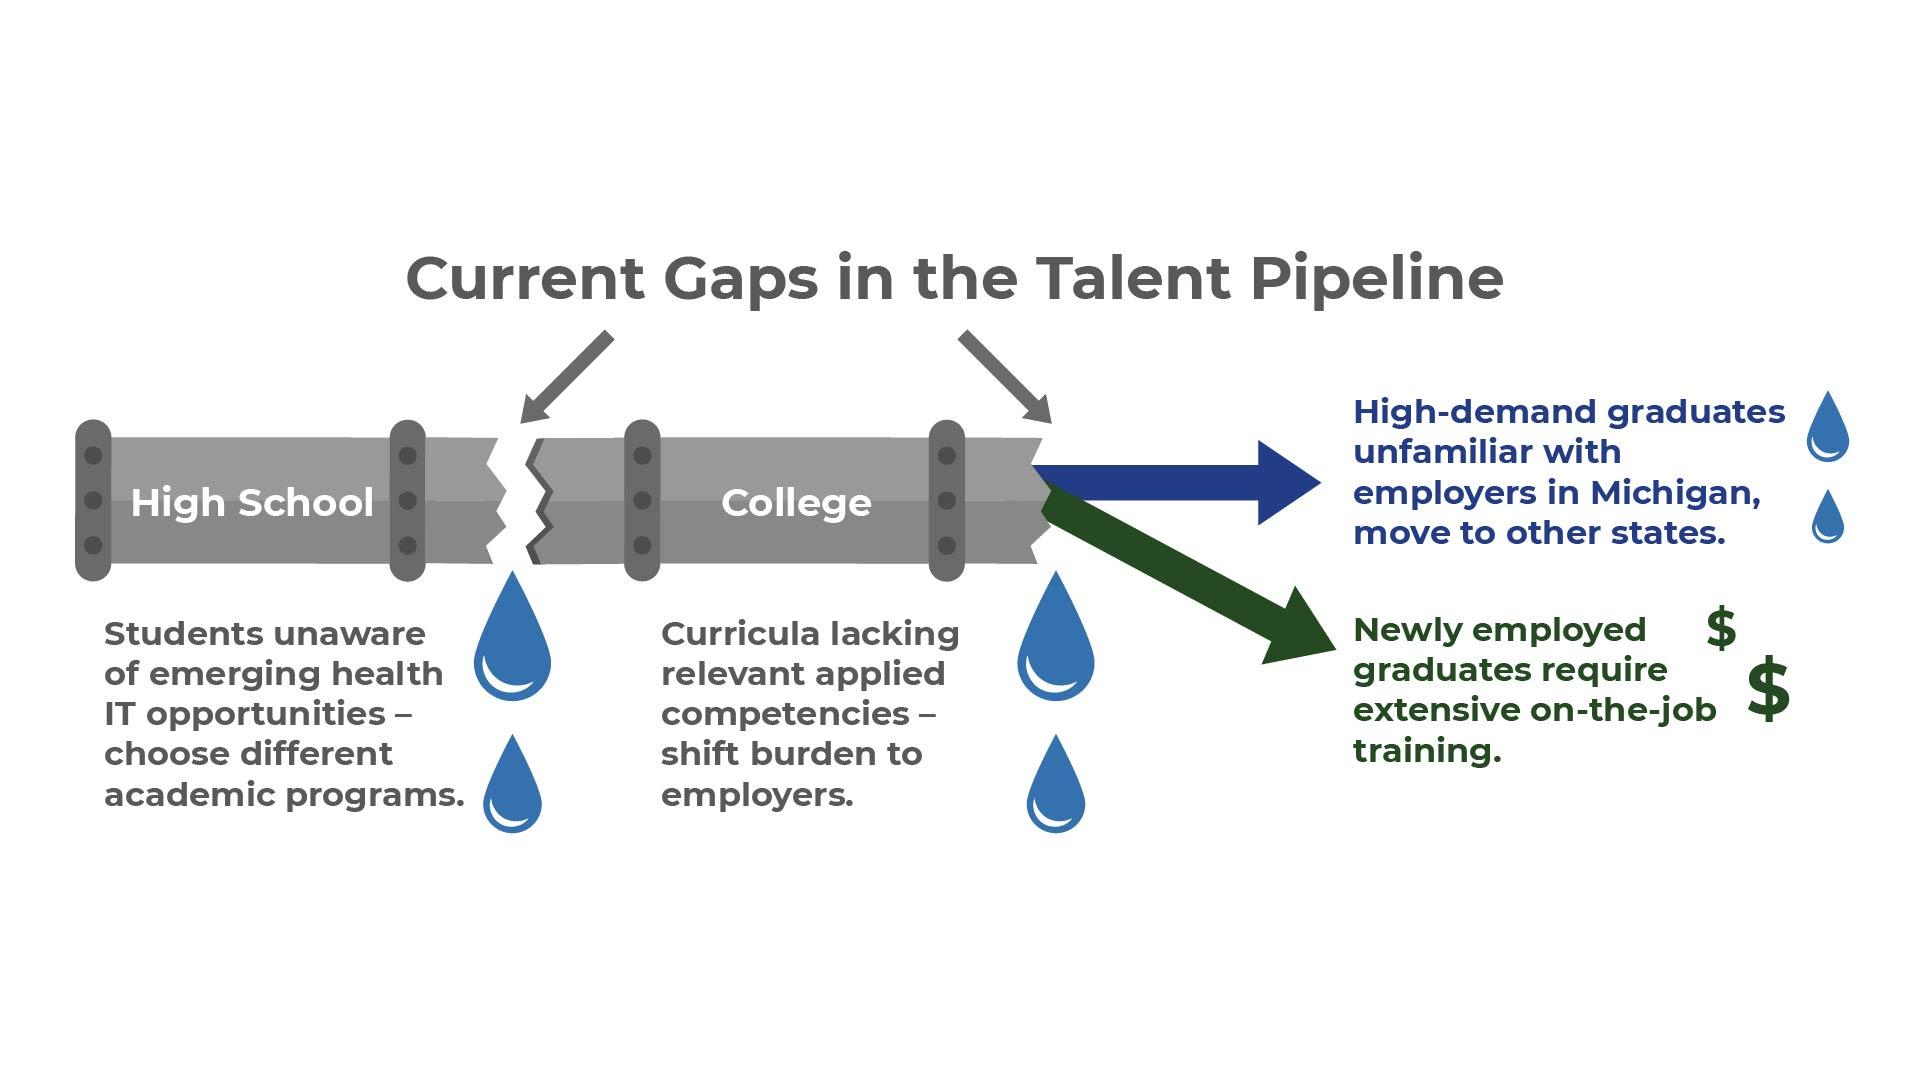 Interoperability Institute Talent Pipeline_GapsCurrent